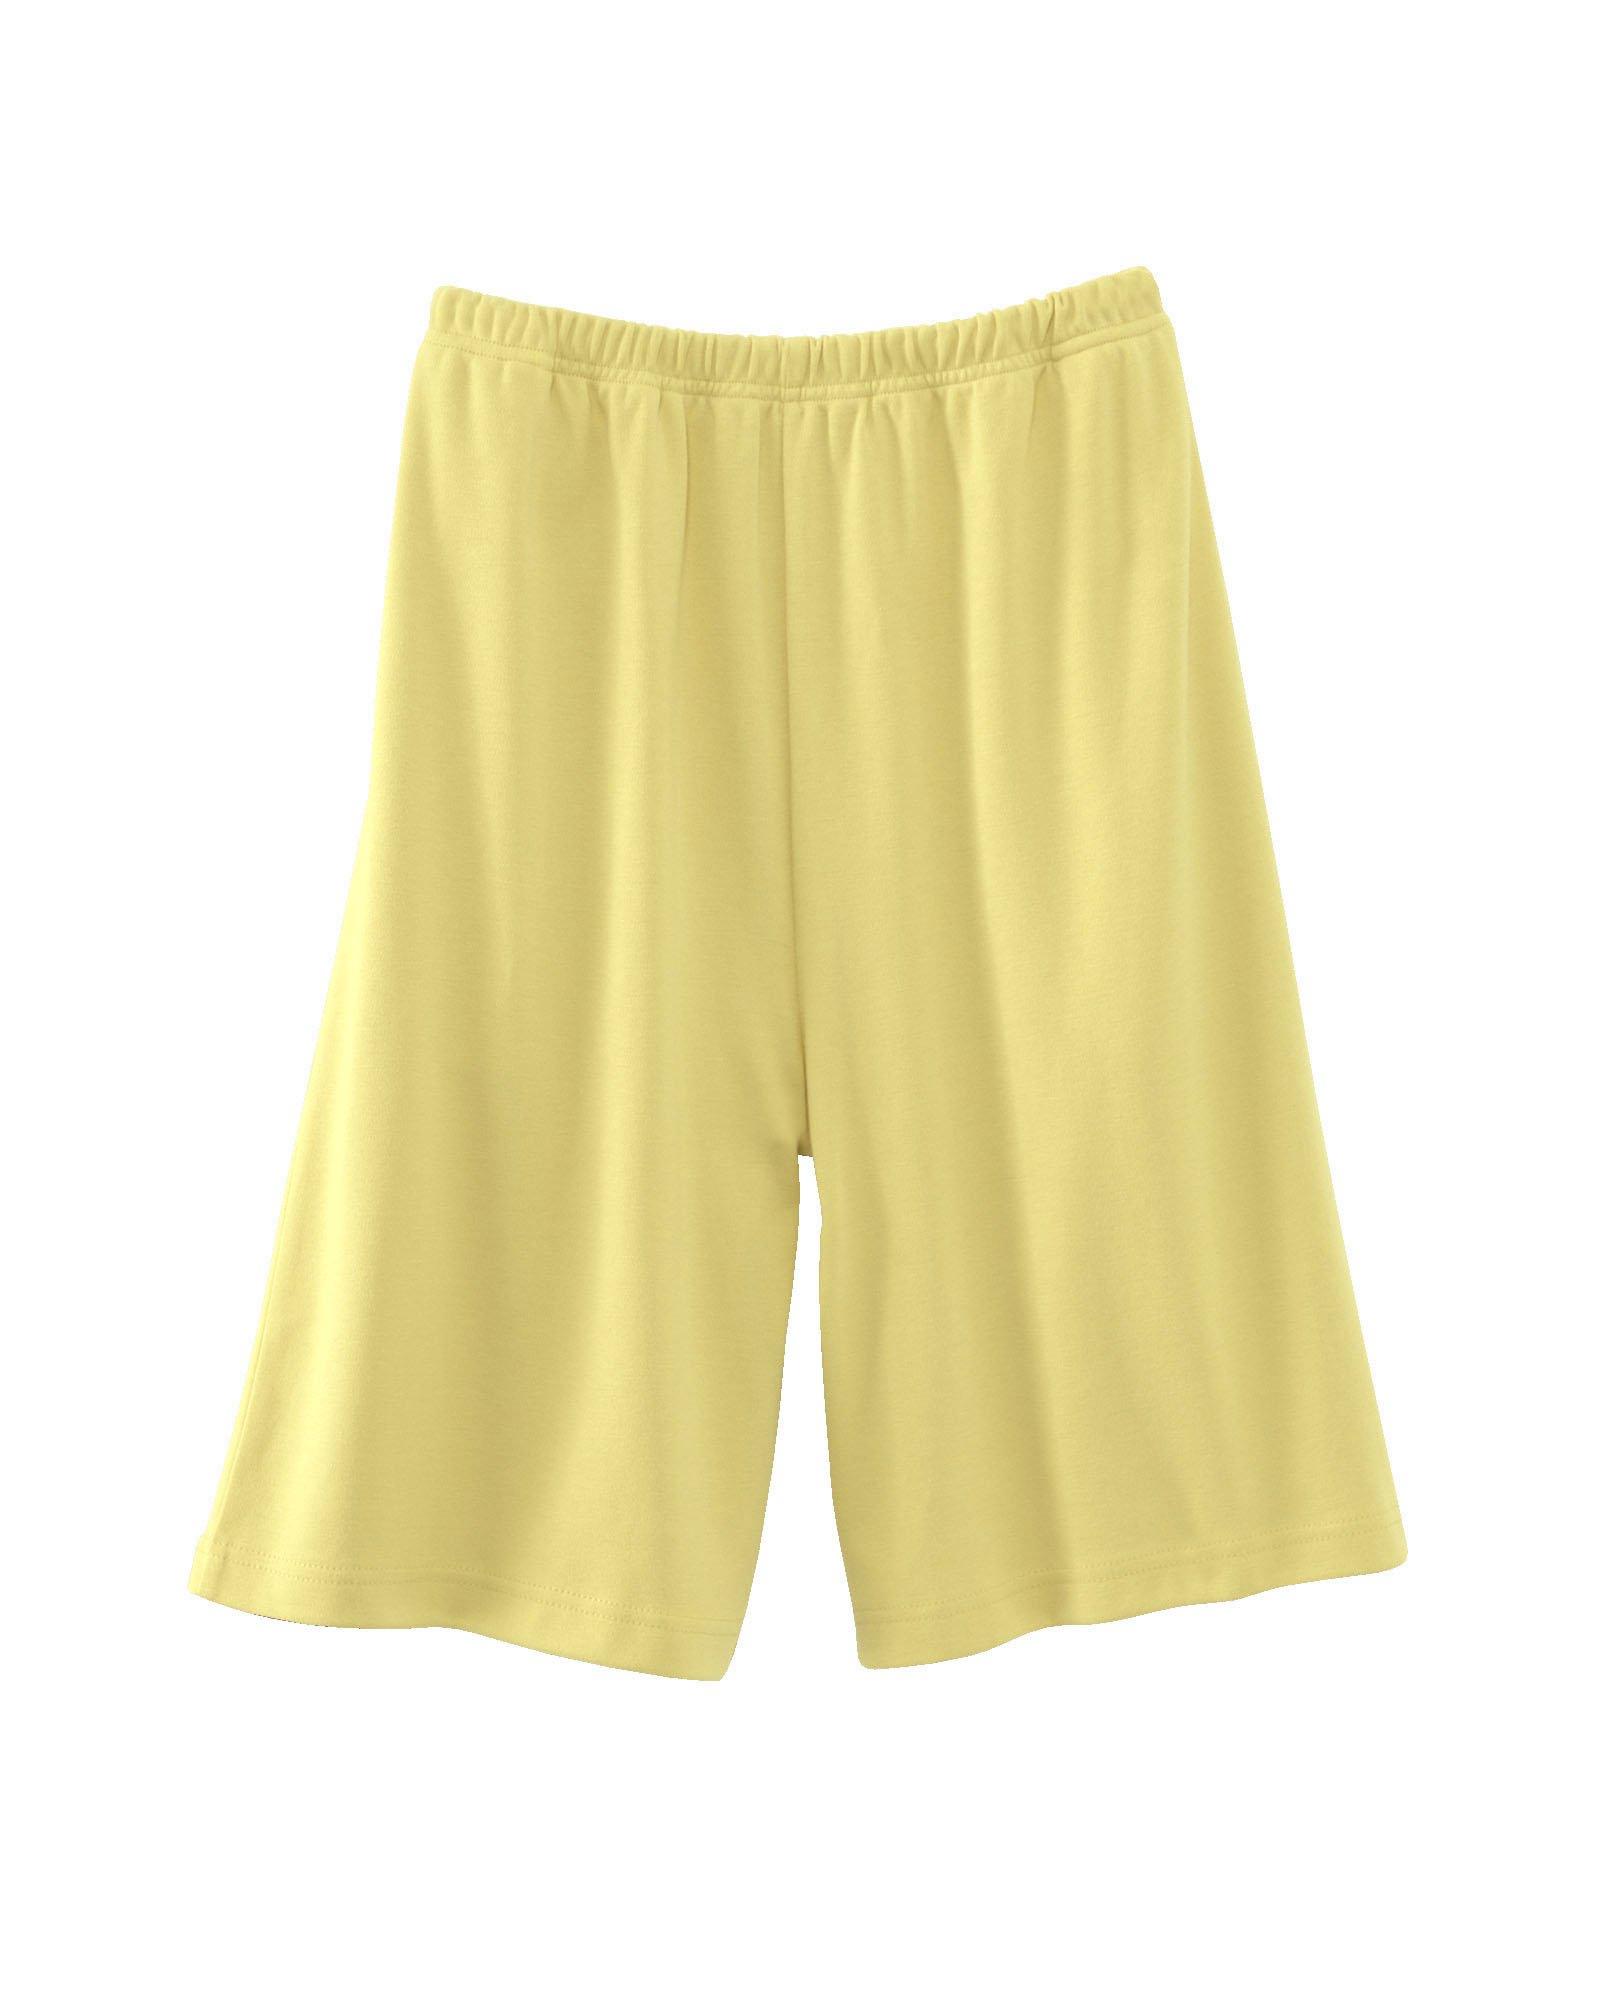 UltraSofts Knit Shorts, Butter, 3X